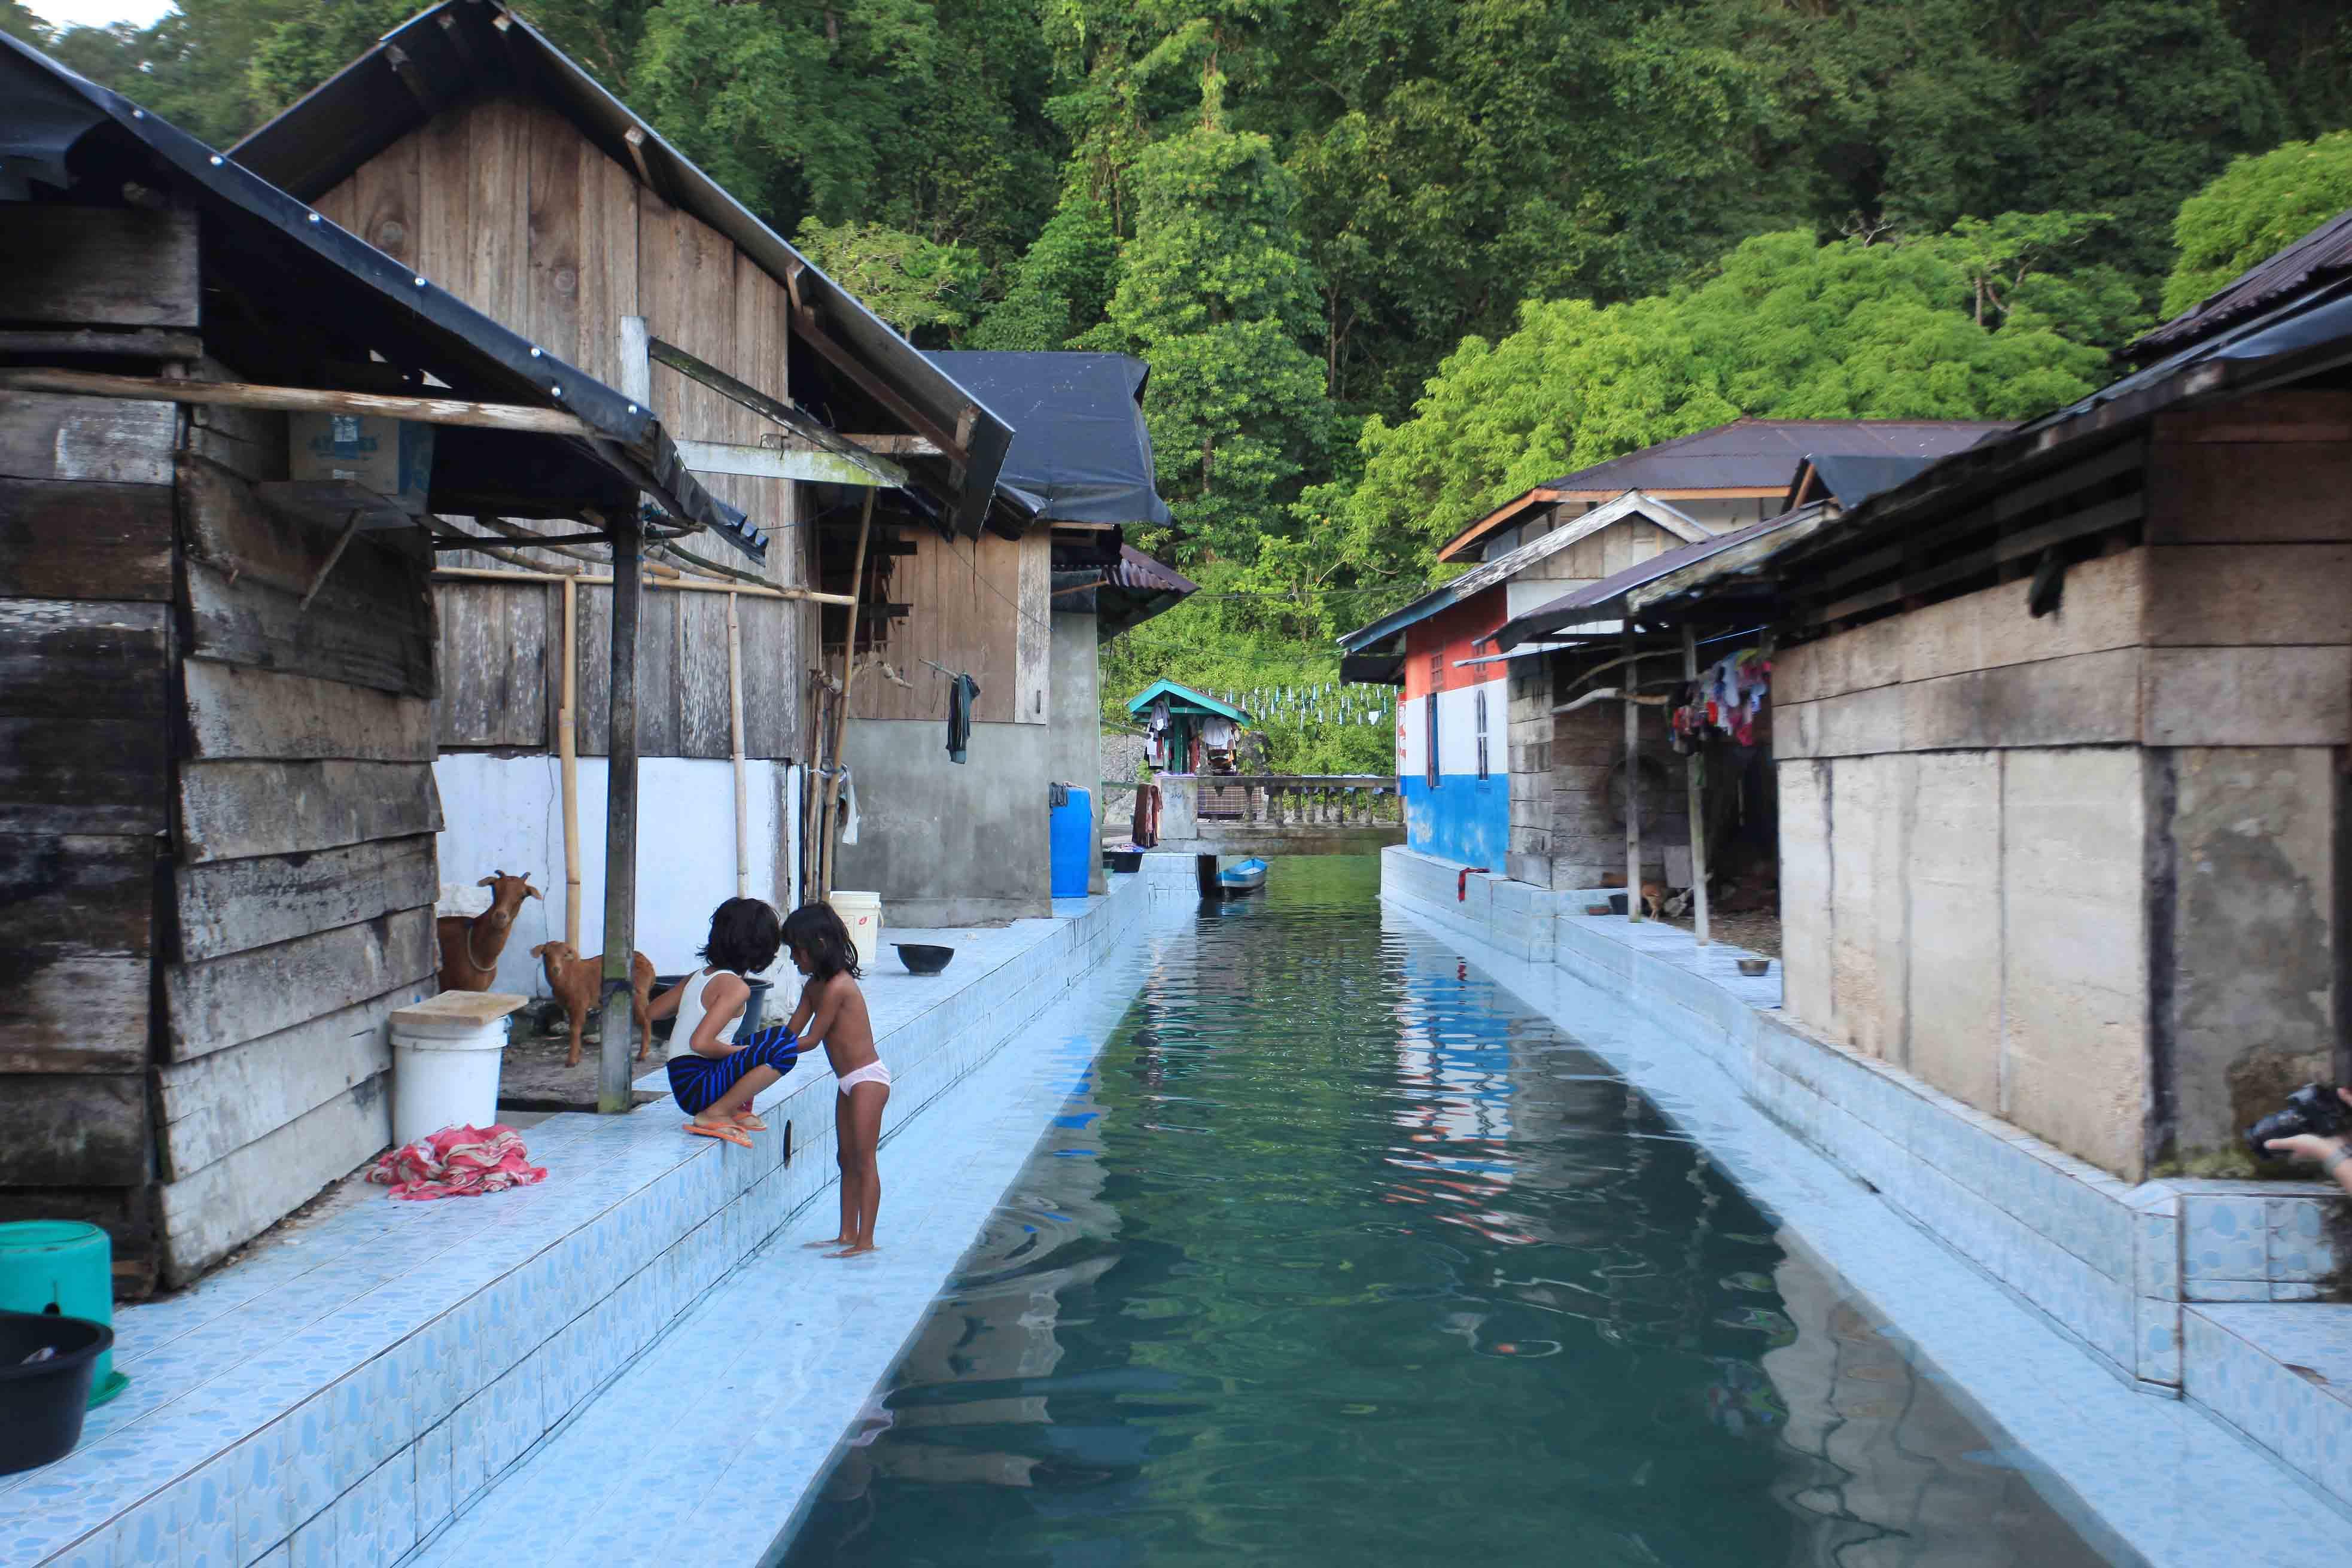 Sumber air bersih warga Desa Sawai